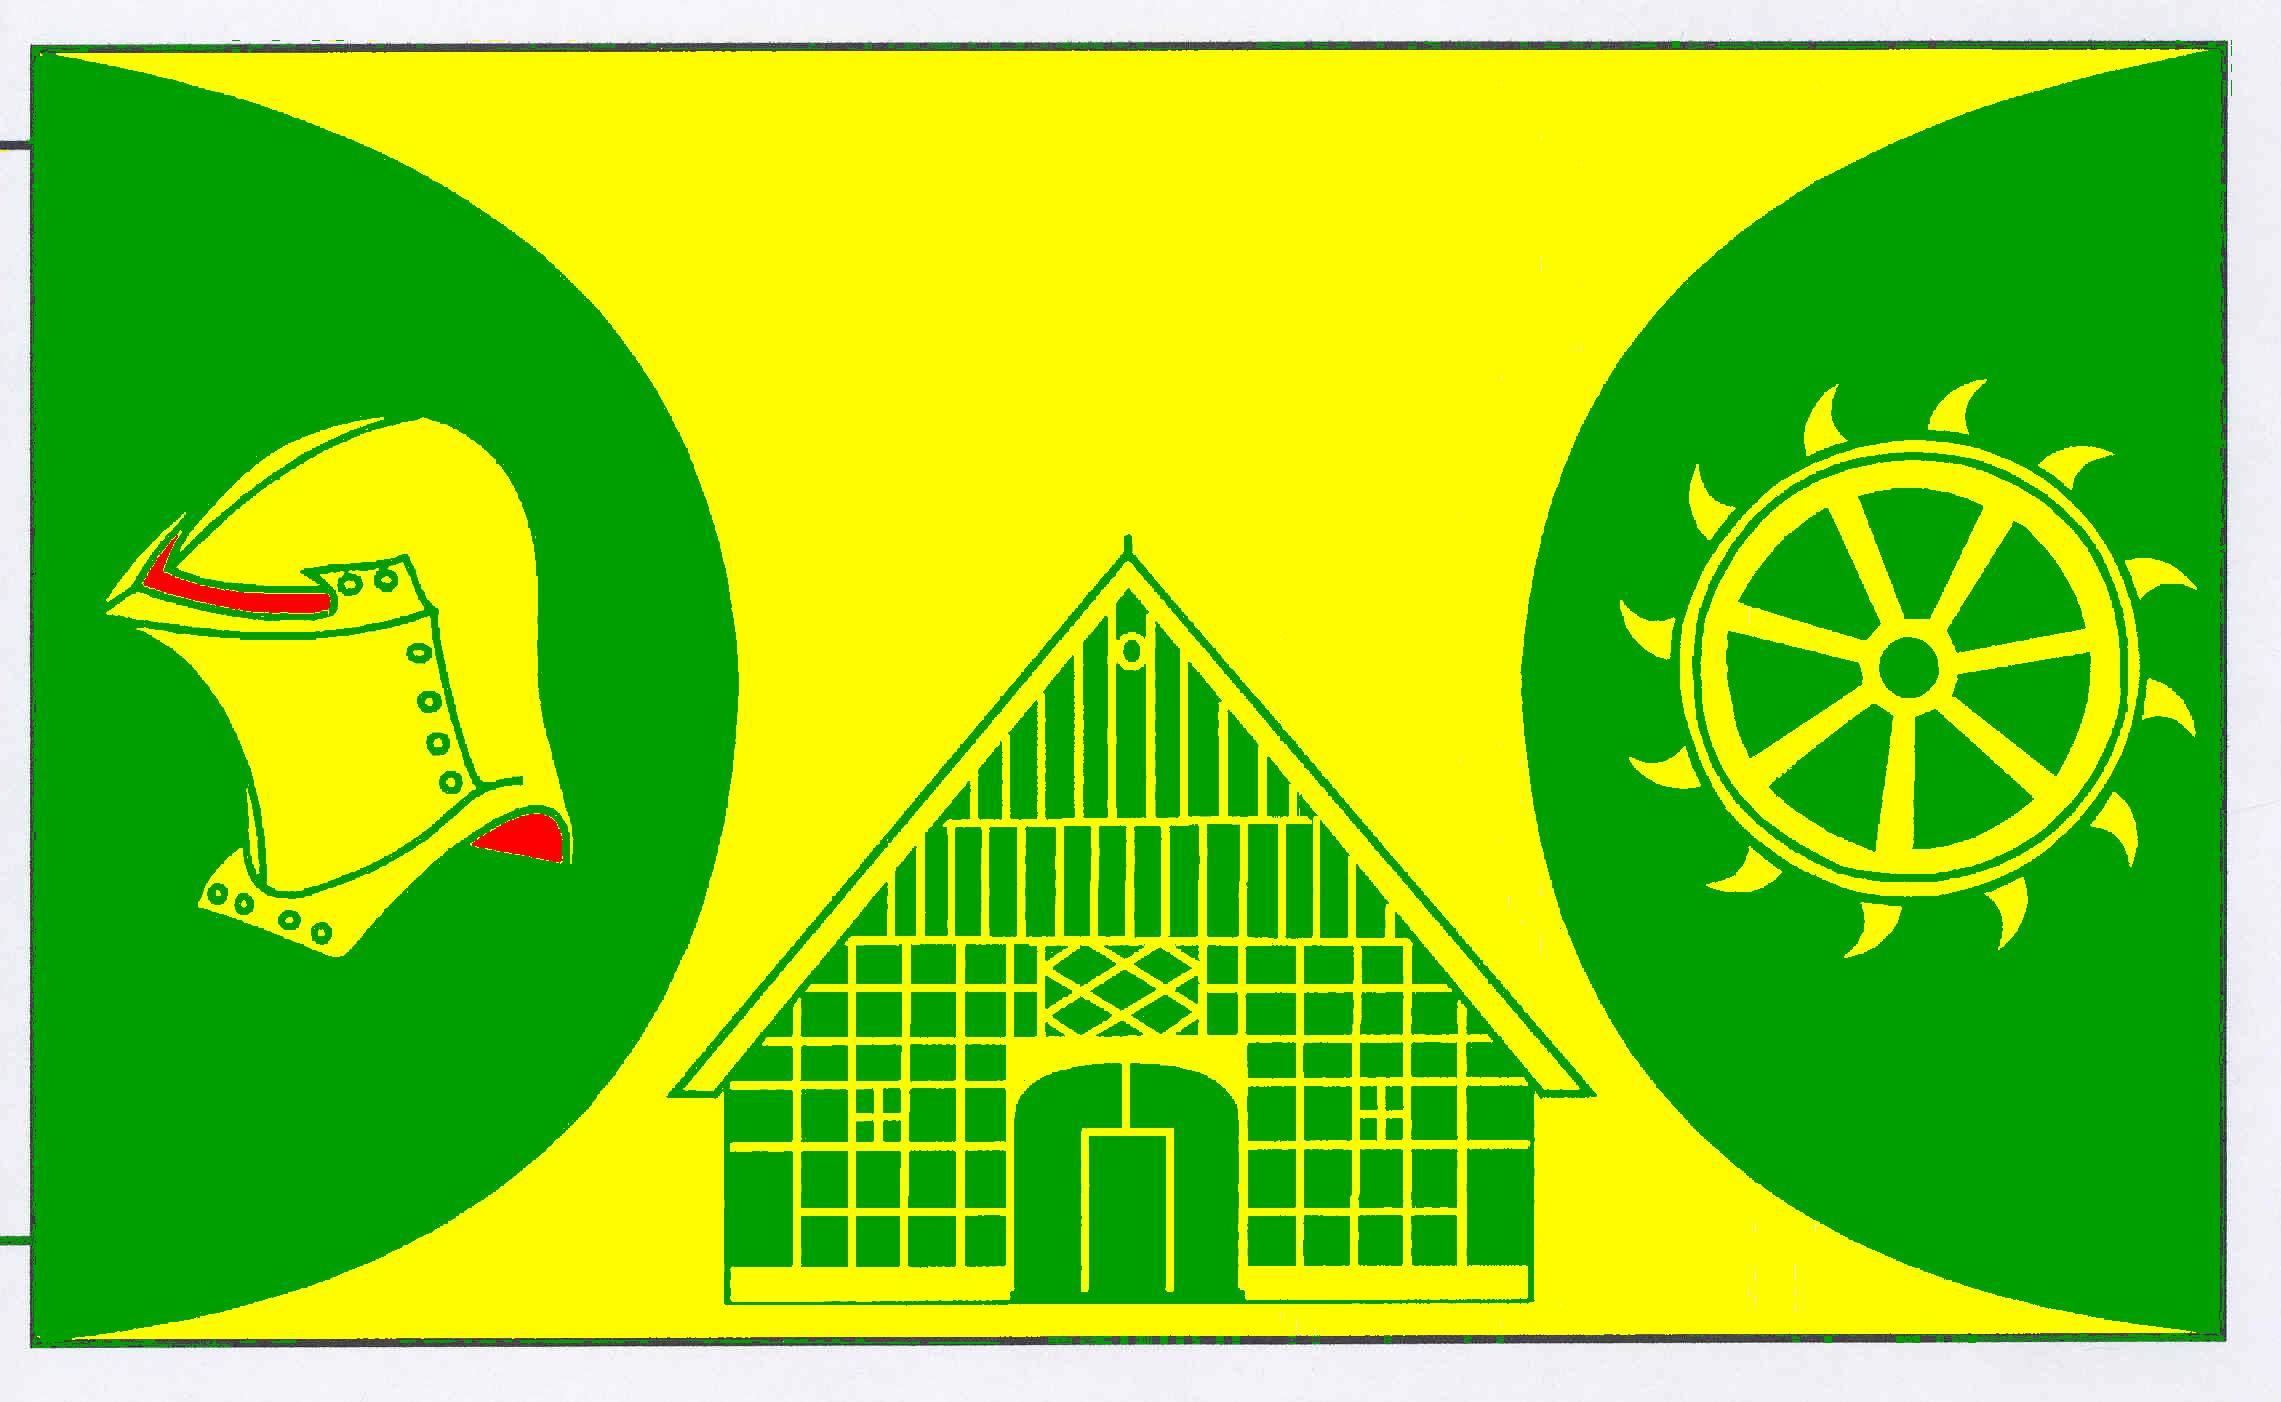 Flagge GemeindeSchmalstede, Kreis Rendsburg-Eckernförde